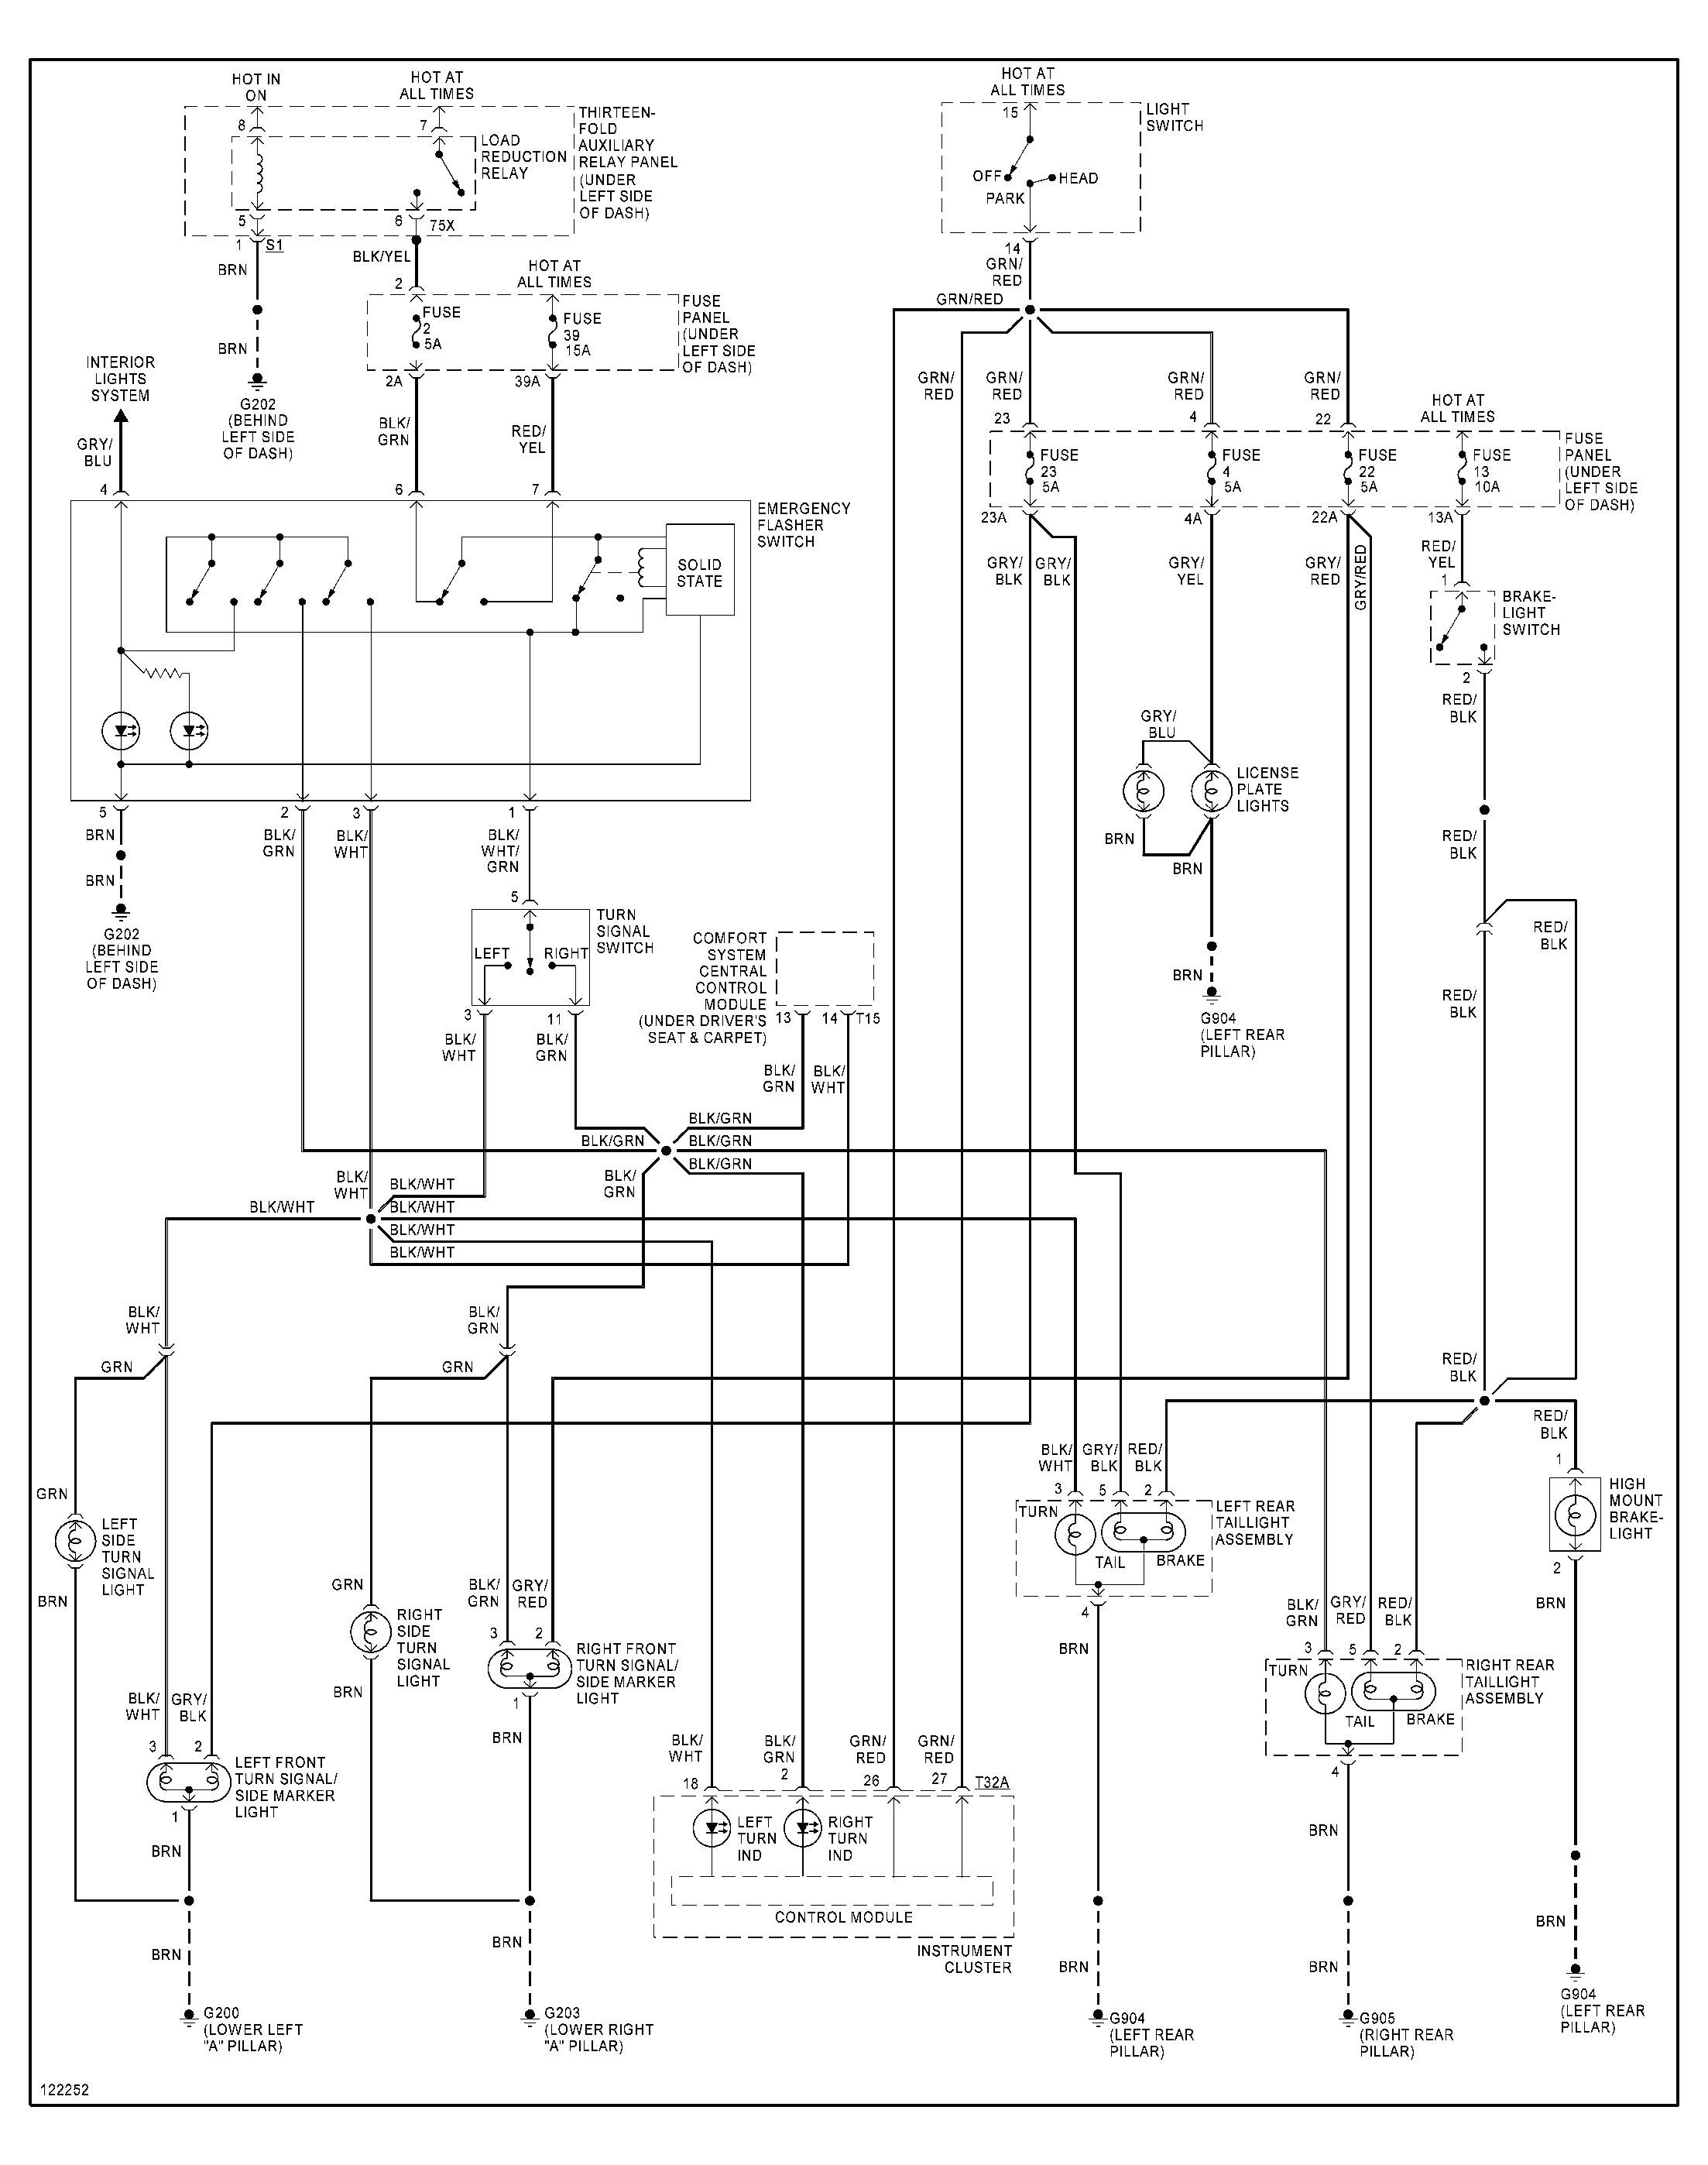 vw jetta vr6 ac wiring diagram besides 2000 impala fuse box diagram2000 vw jetta ac wiring